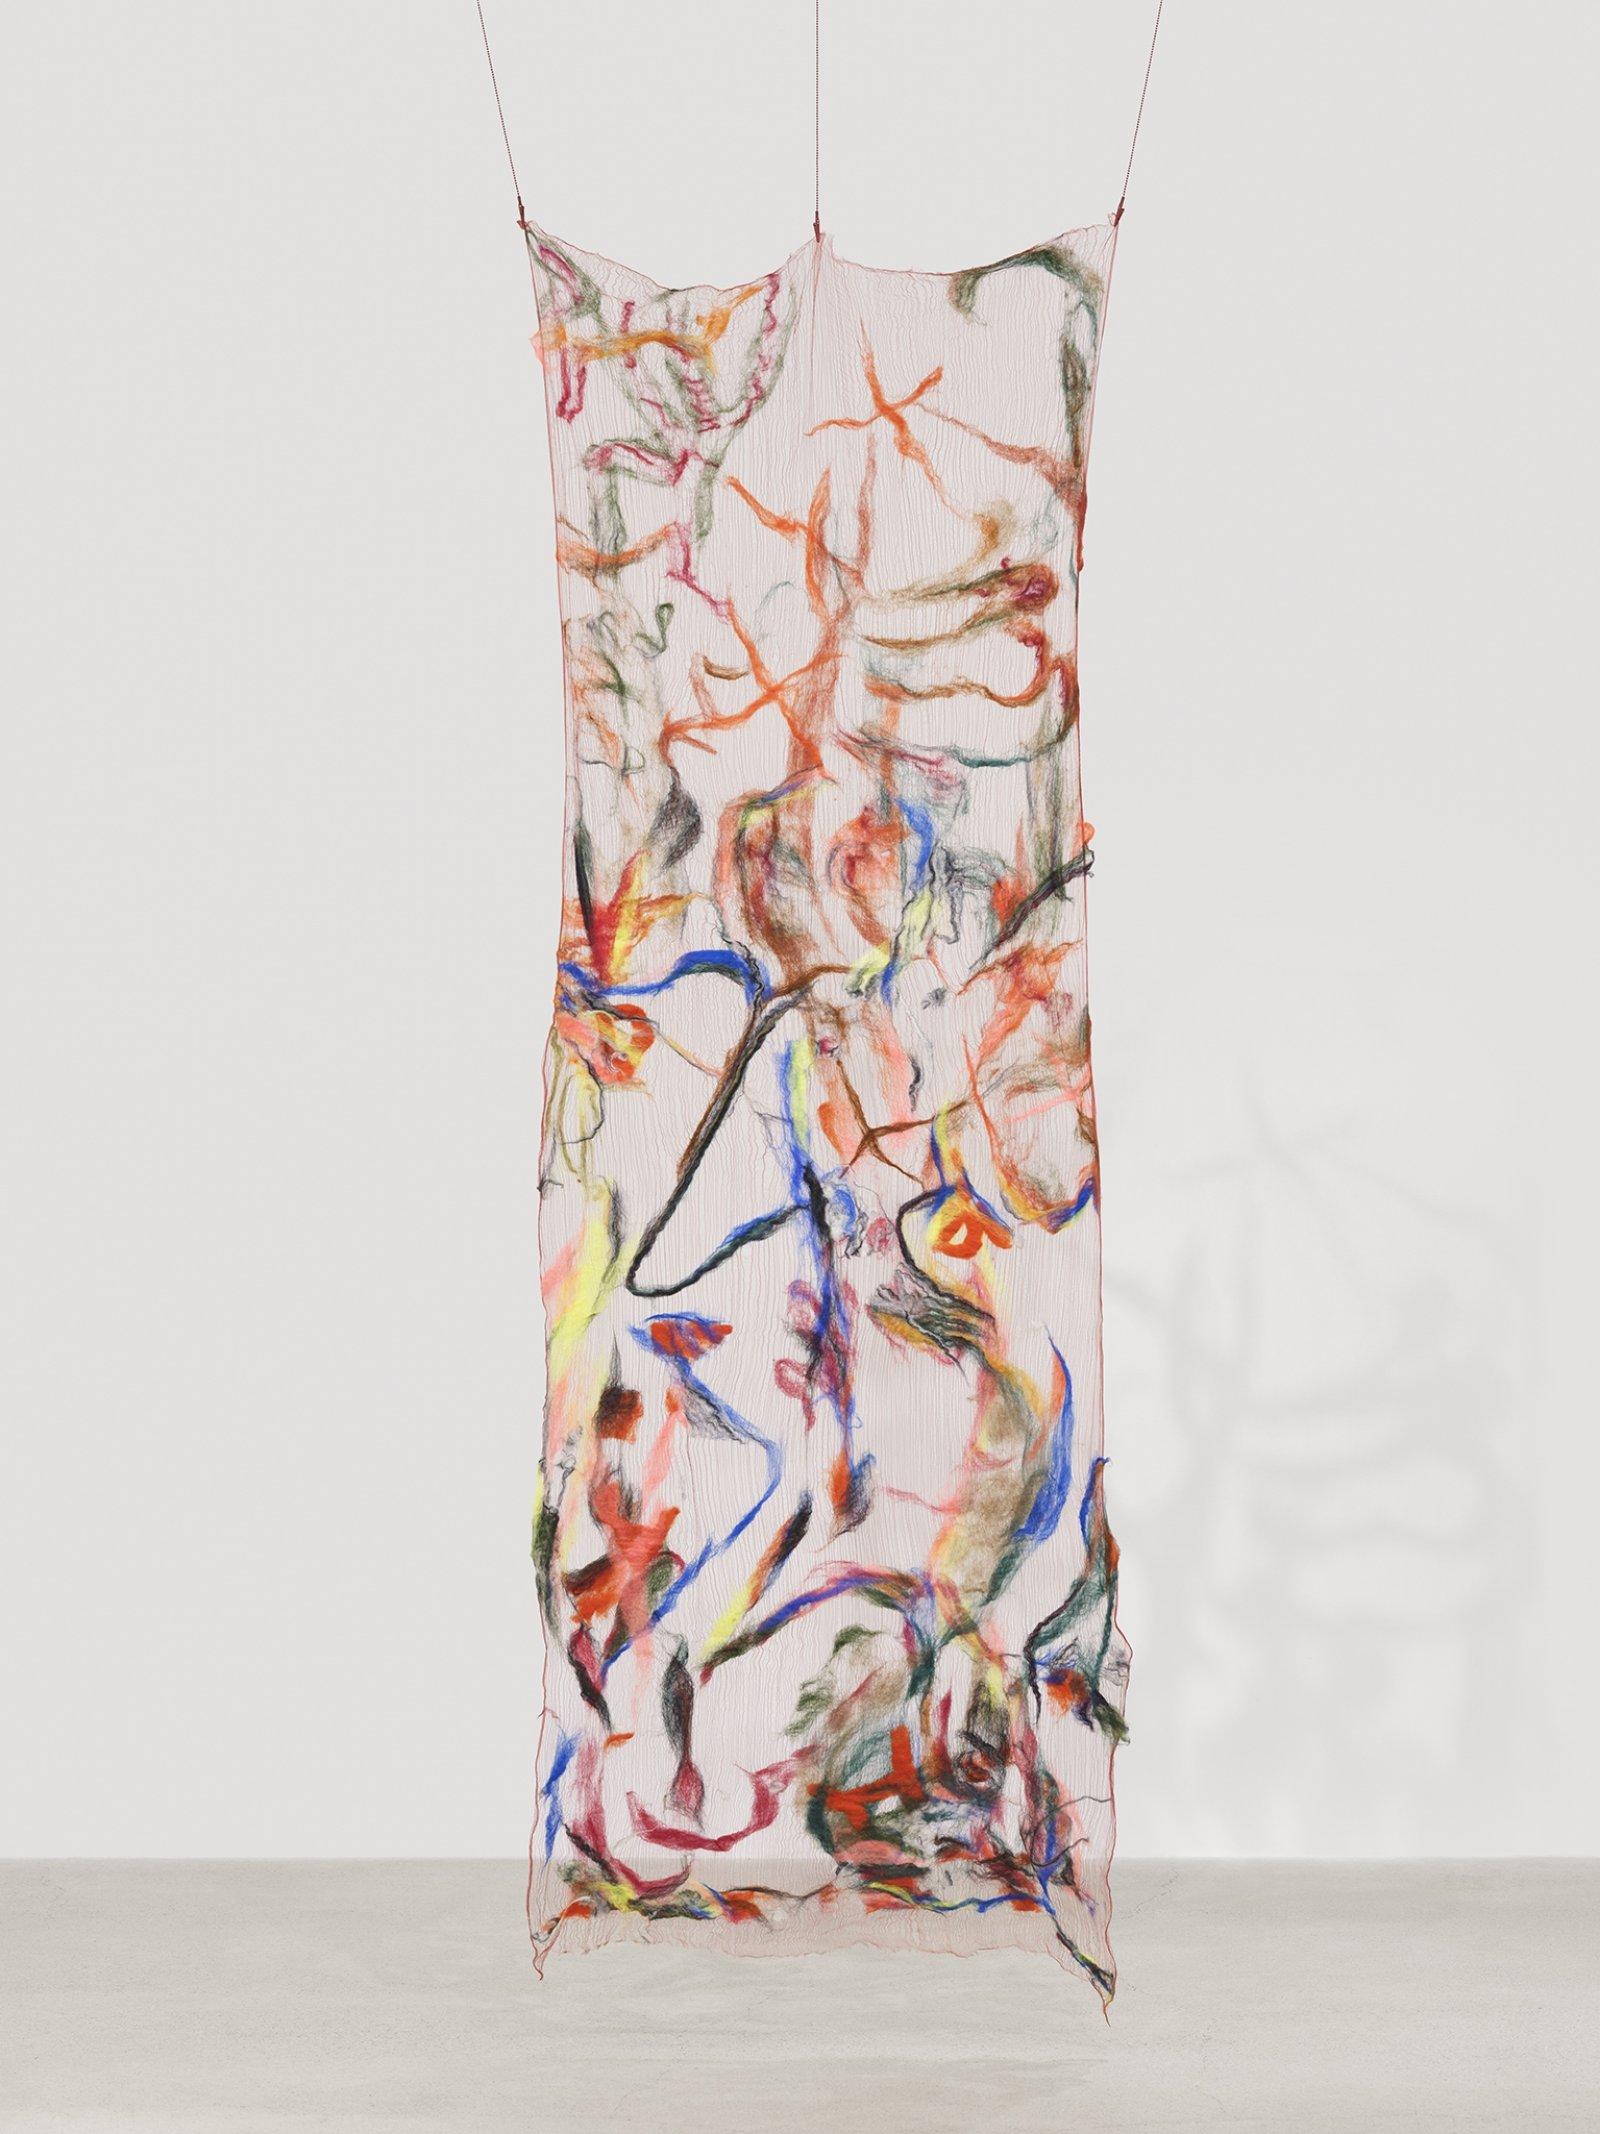 Rebecca Brewer, Scrim: Tweaker, 2019, silk, wool, ball chain, alligator clips, hooks, 103 x 39 in. (262 x 99 cm)